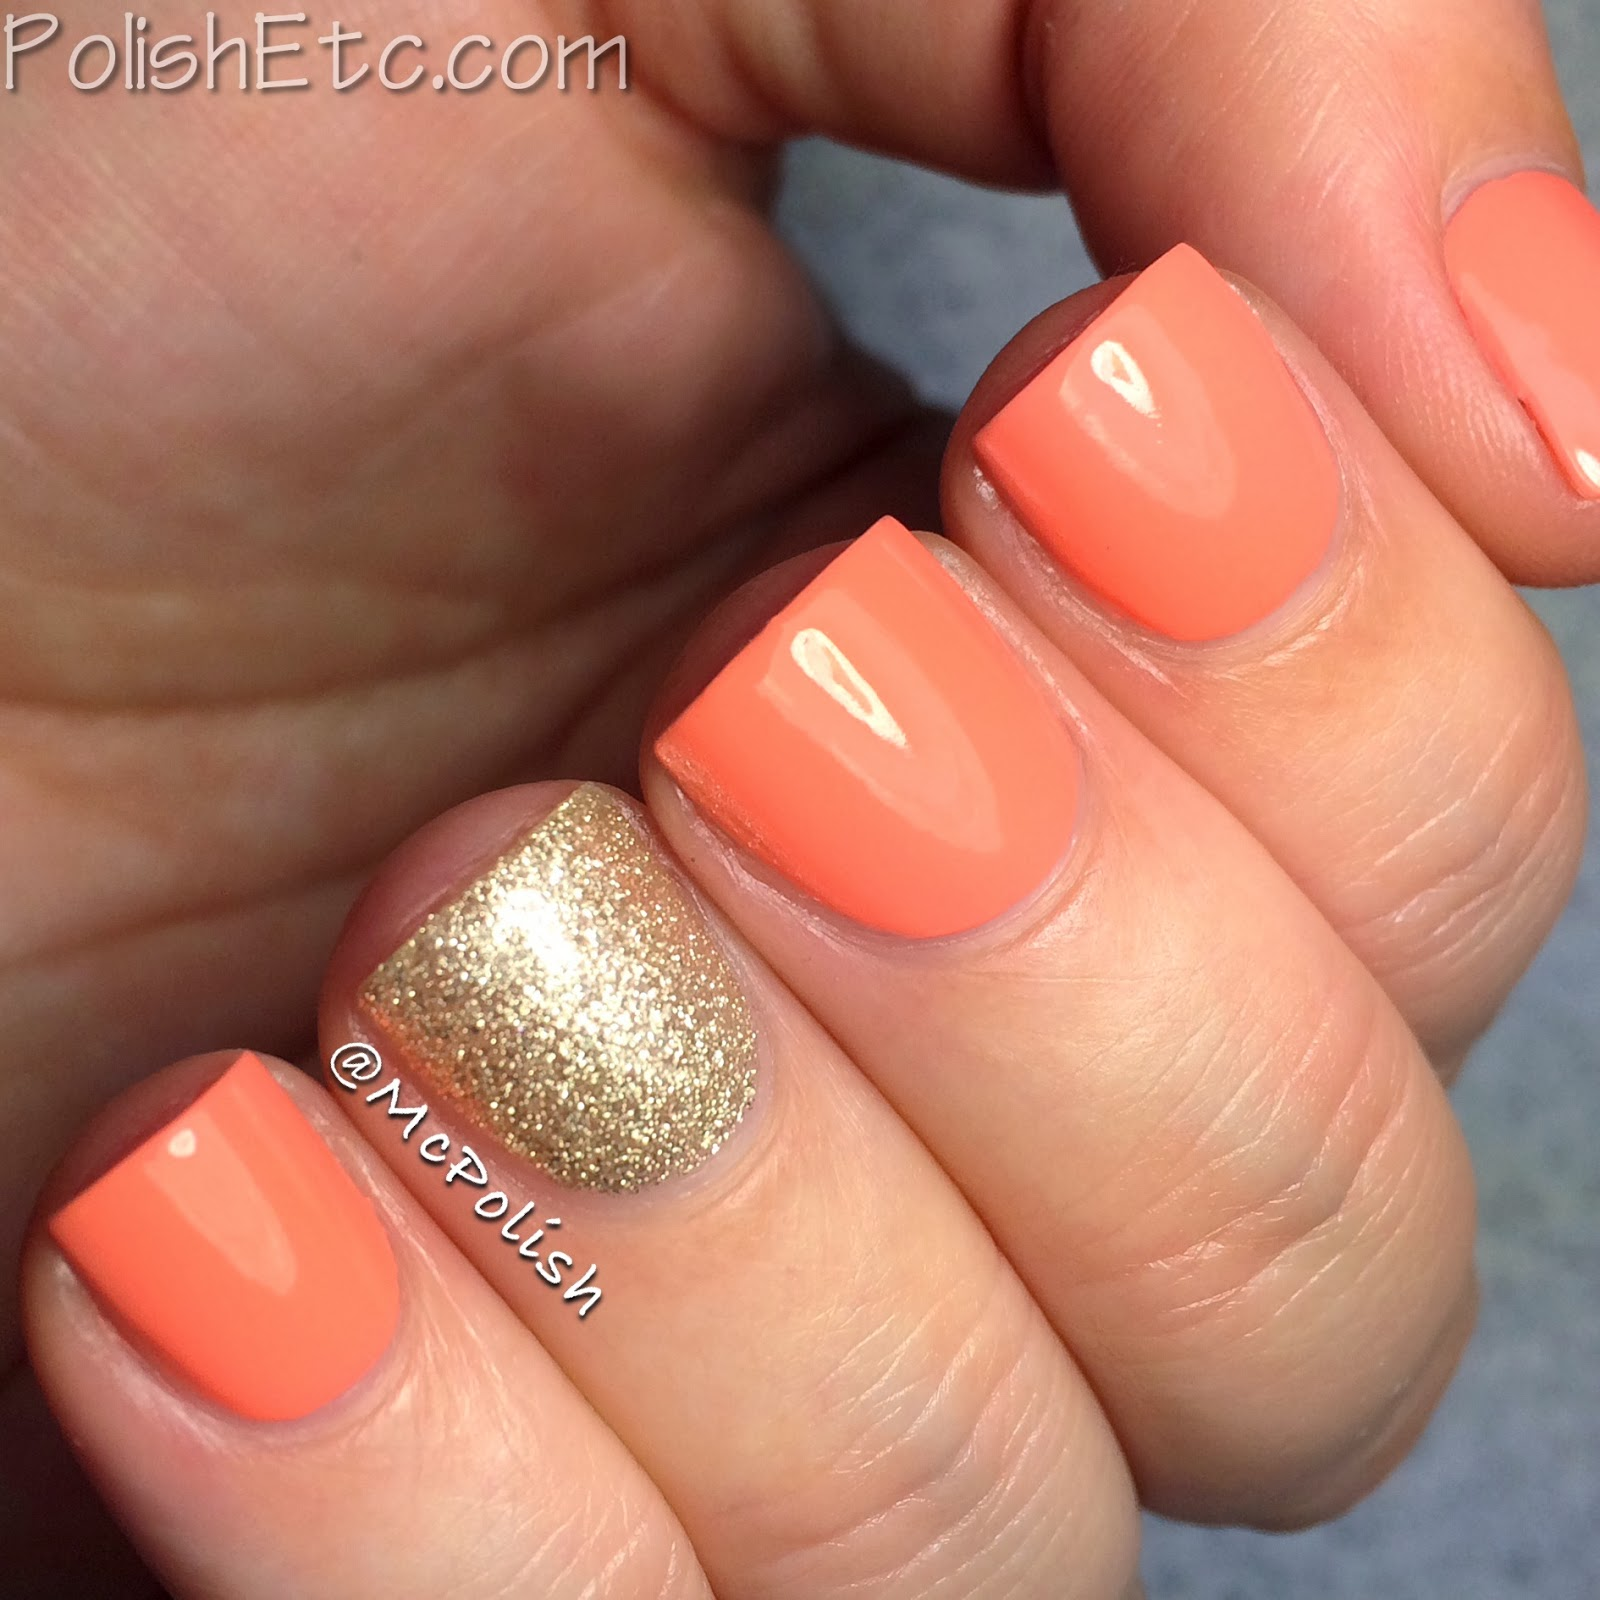 Revlon Parfumerie scented nail polish in Apricot Nectar